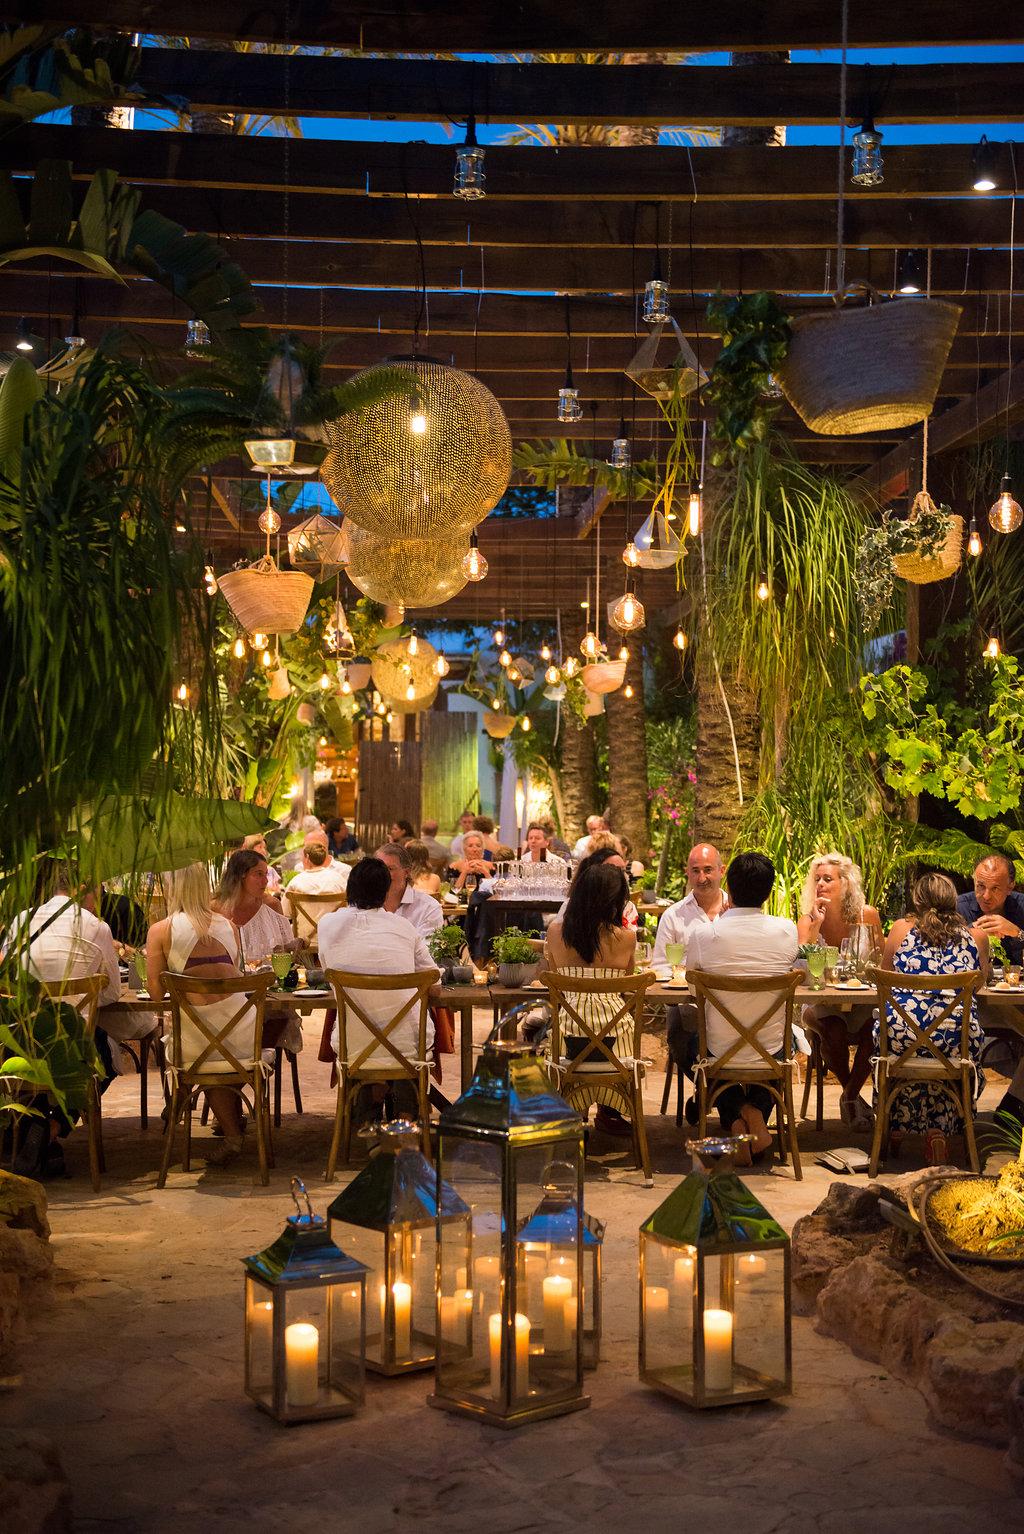 Al fresco dining Ibiza, ibiza events, obi and the island